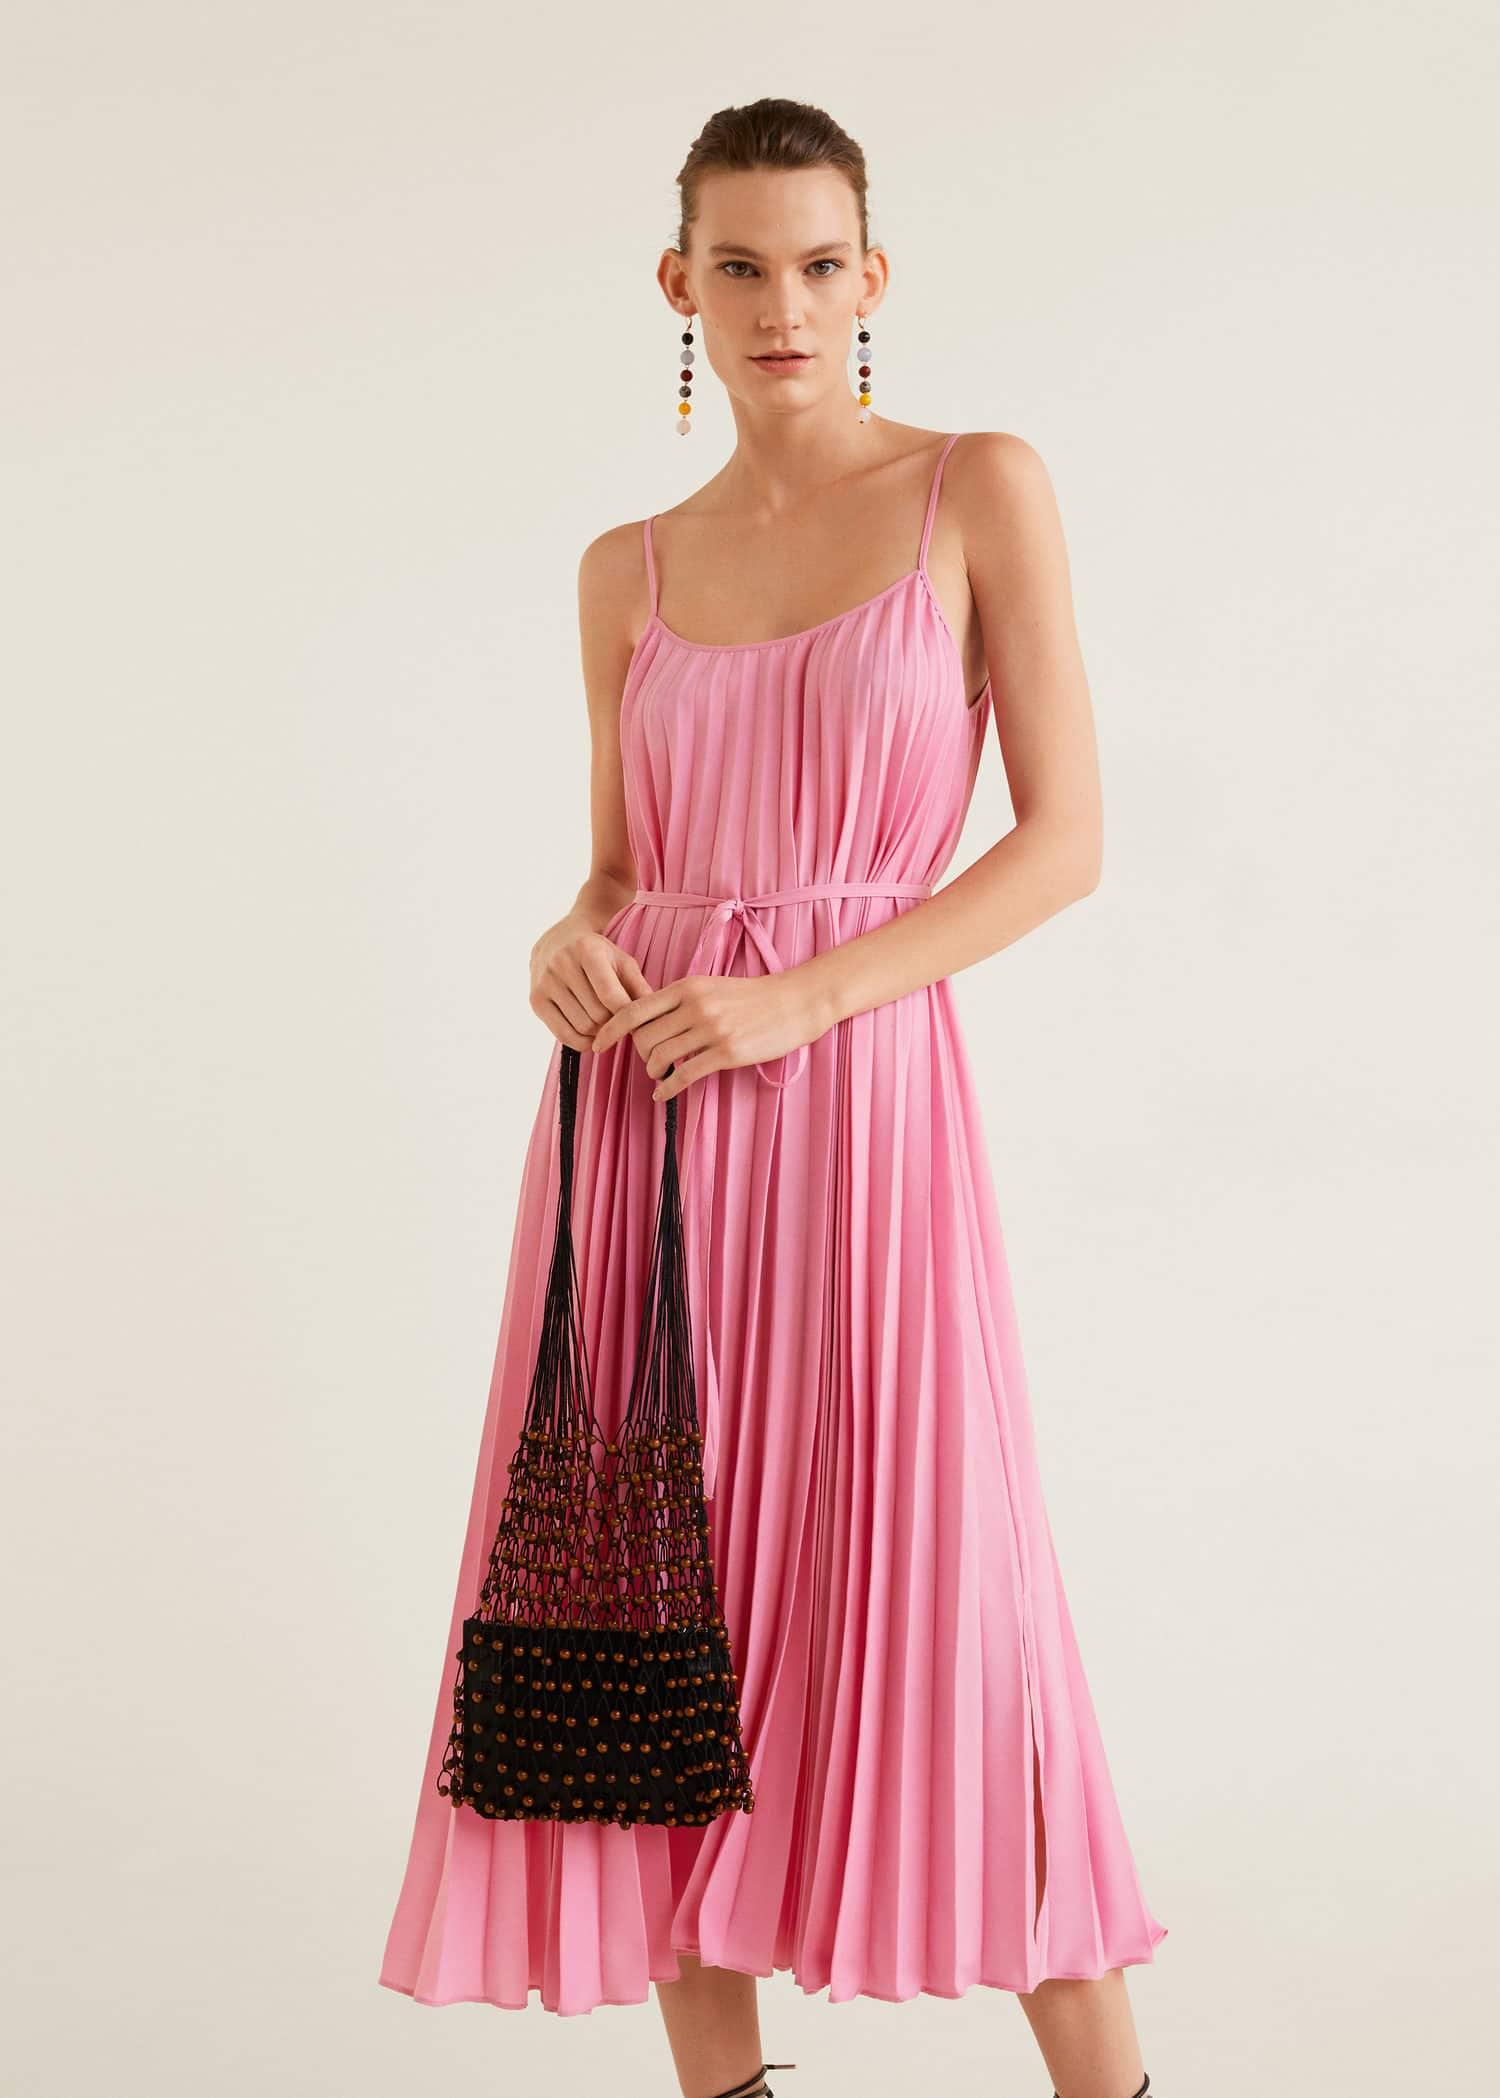 Shiny Camo Satin Formal Dresses